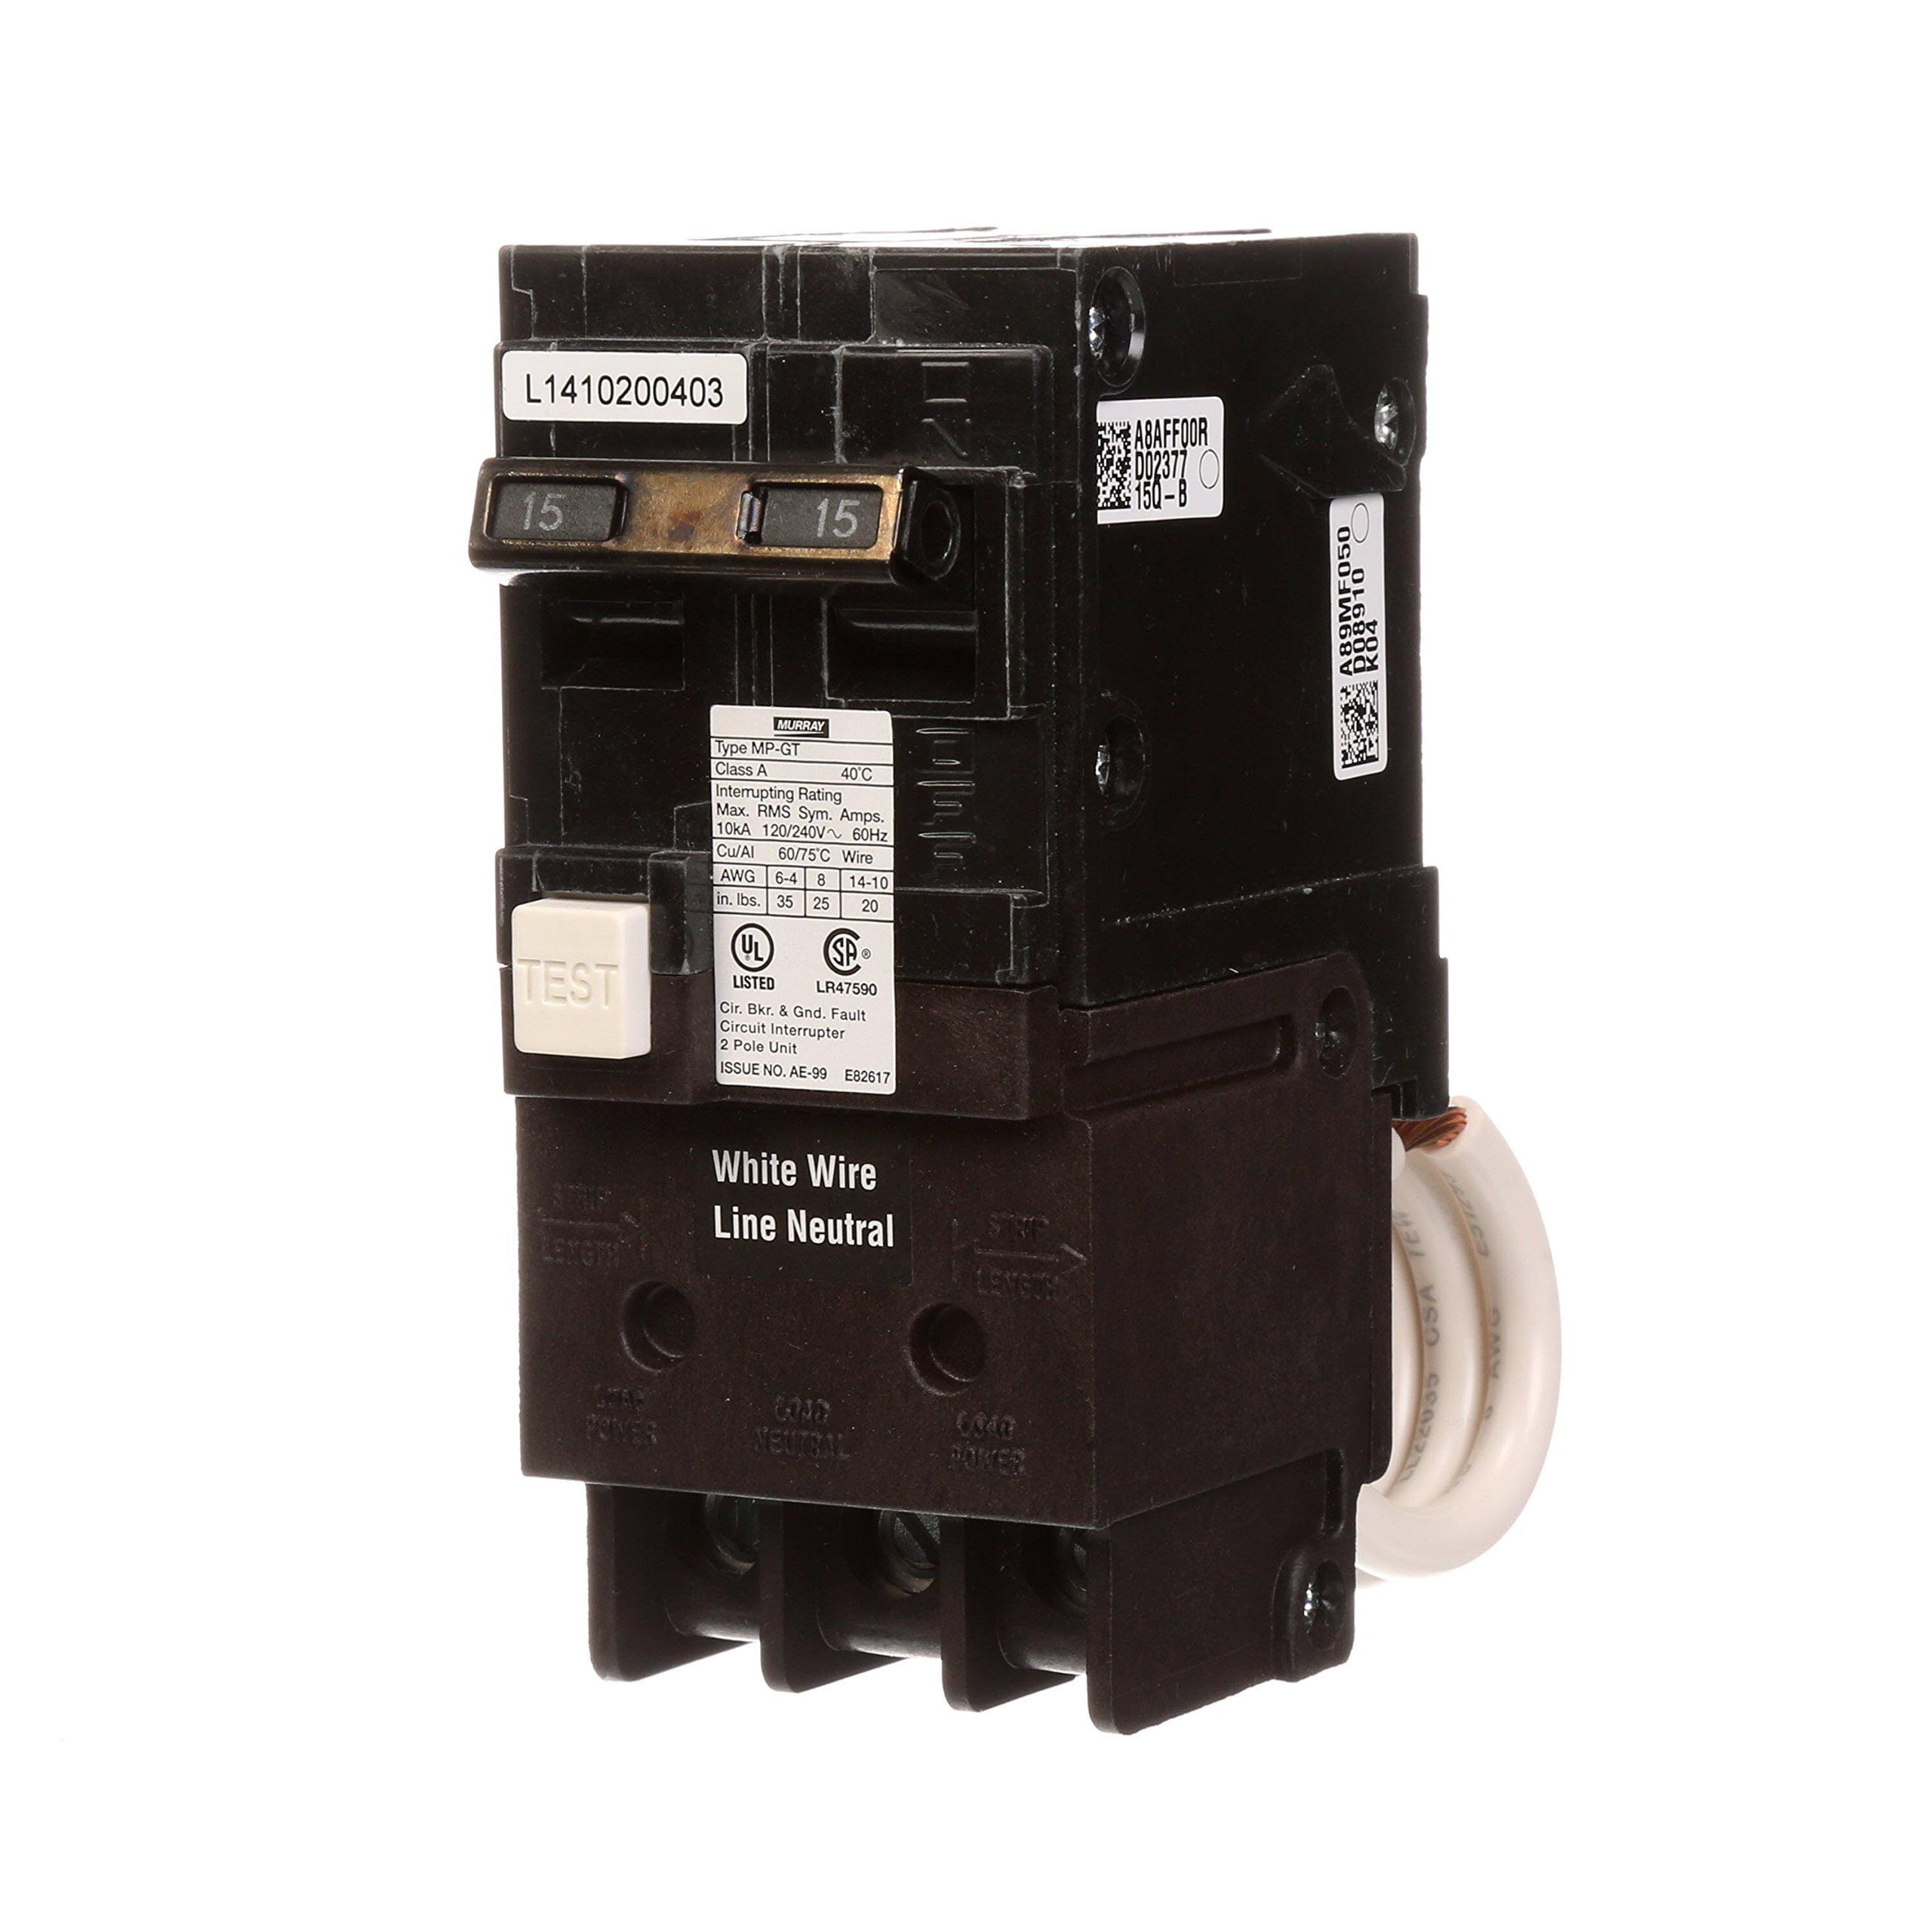 Siemens MP215GFA Low Voltage Residential GFCI Circuit Breaker 2-Pole 15 Amp 120/240 Volt